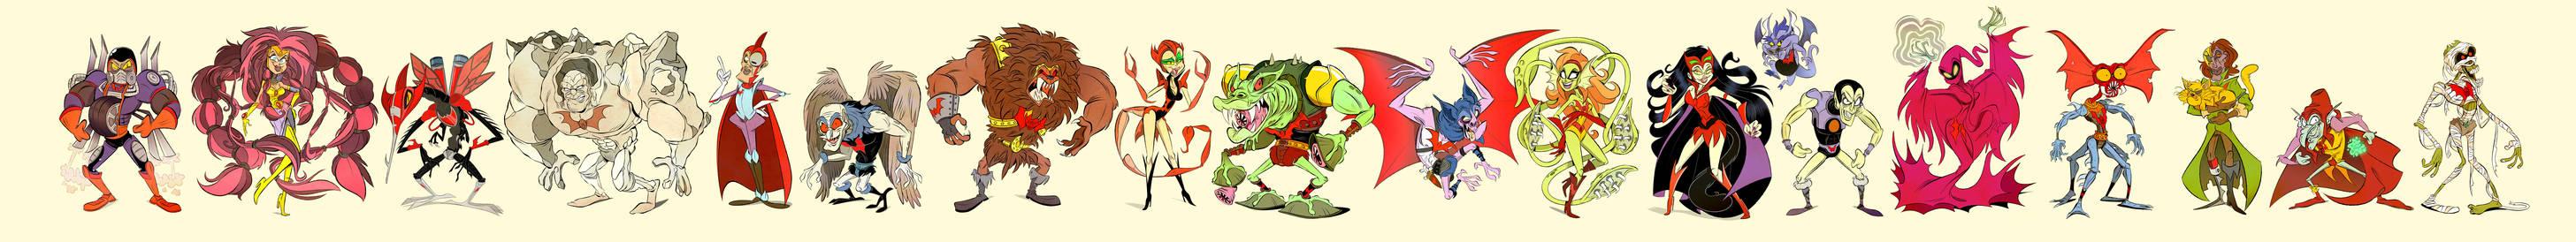 The Evil Horde (v.0.1)